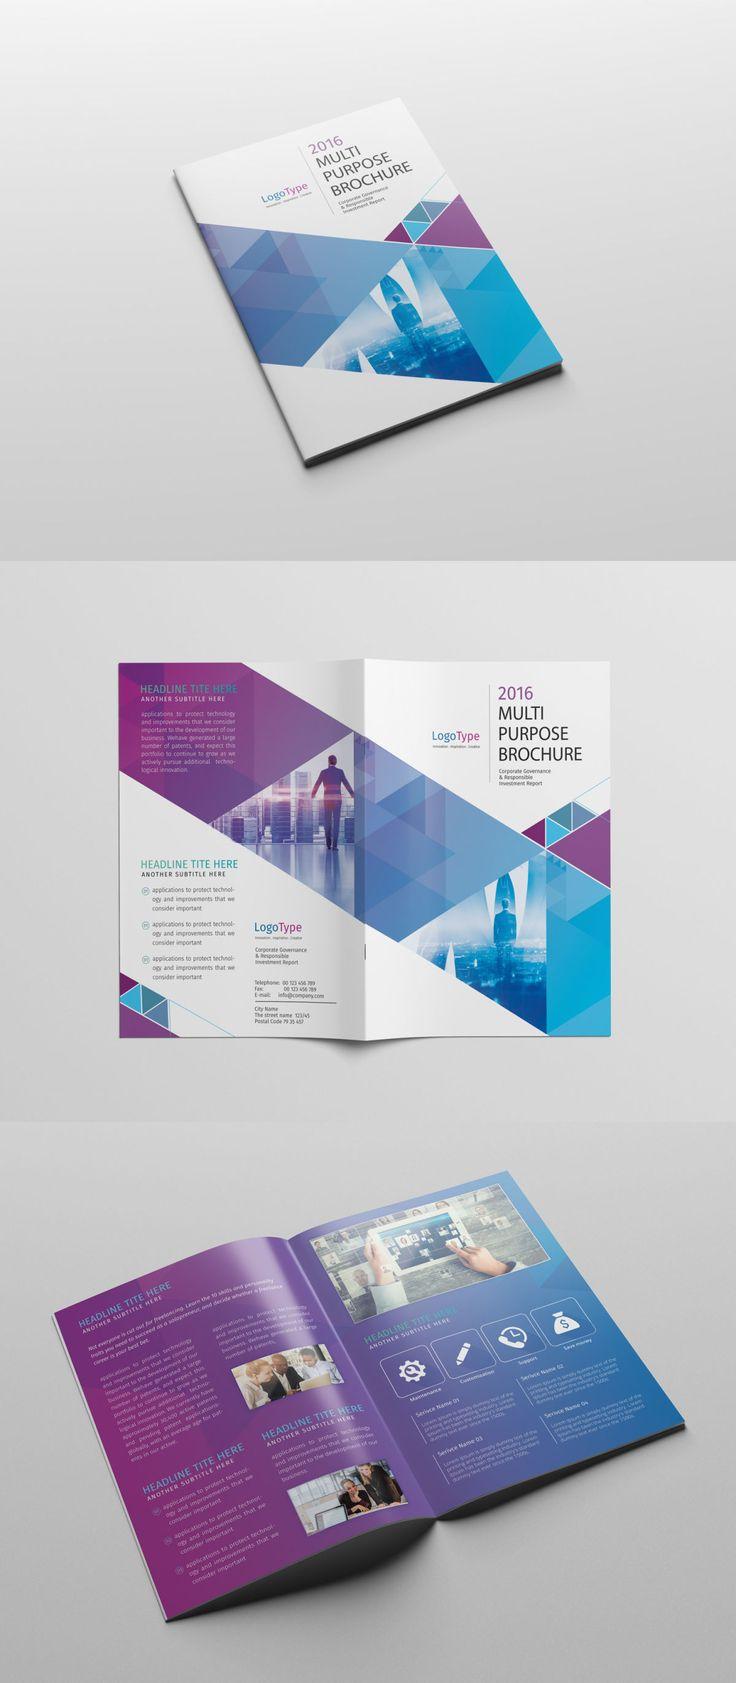 Abstract Bi-Fold Brochure Template PSD